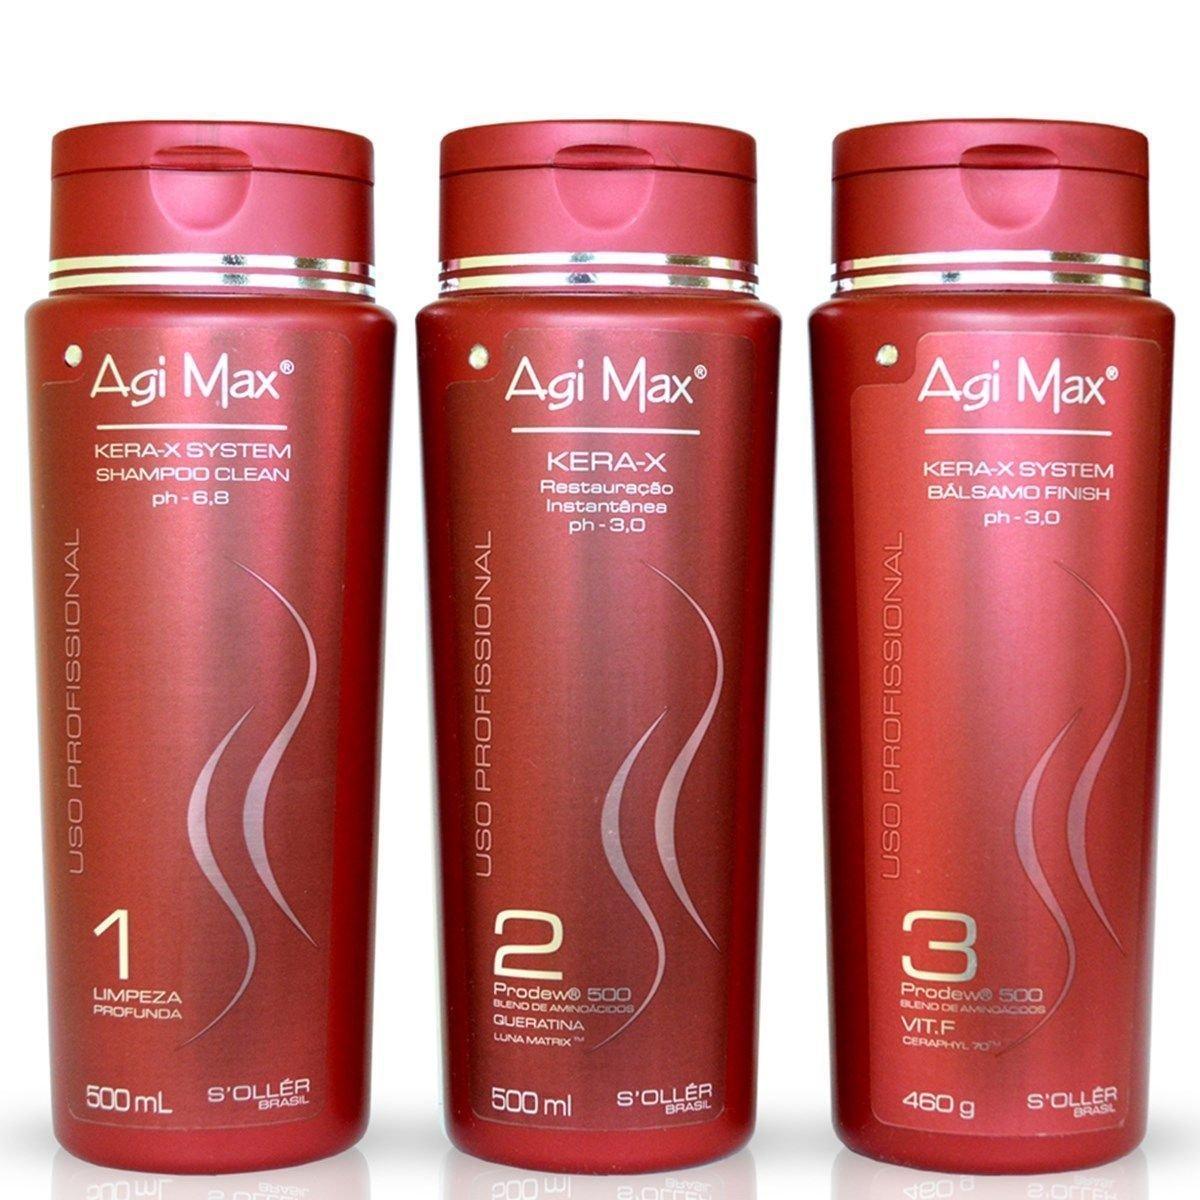 Agi Max Brazilian Keratin Hair Treatment Kit 500ml - 3 Steps (3 x 500ml) - The Best Straightening!